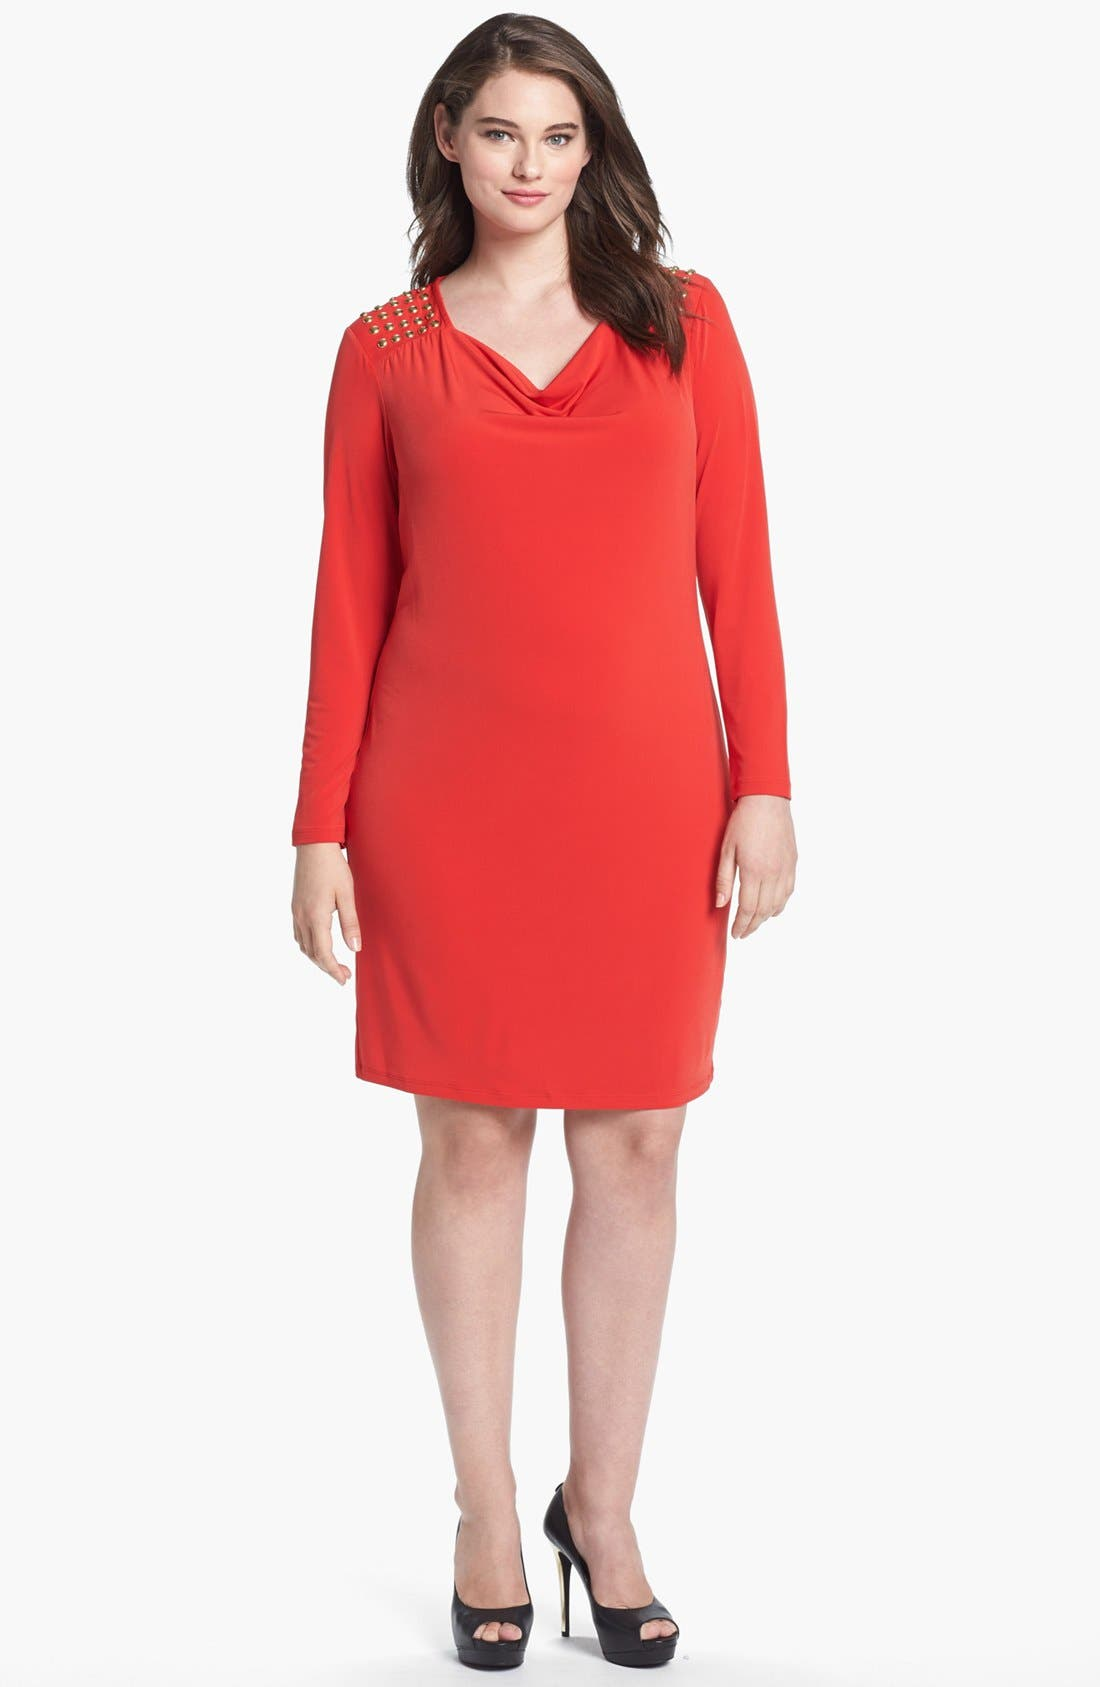 Alternate Image 1 Selected - MICHAEL Michael Kors Studded Cowl Neck Dress (Plus Size)